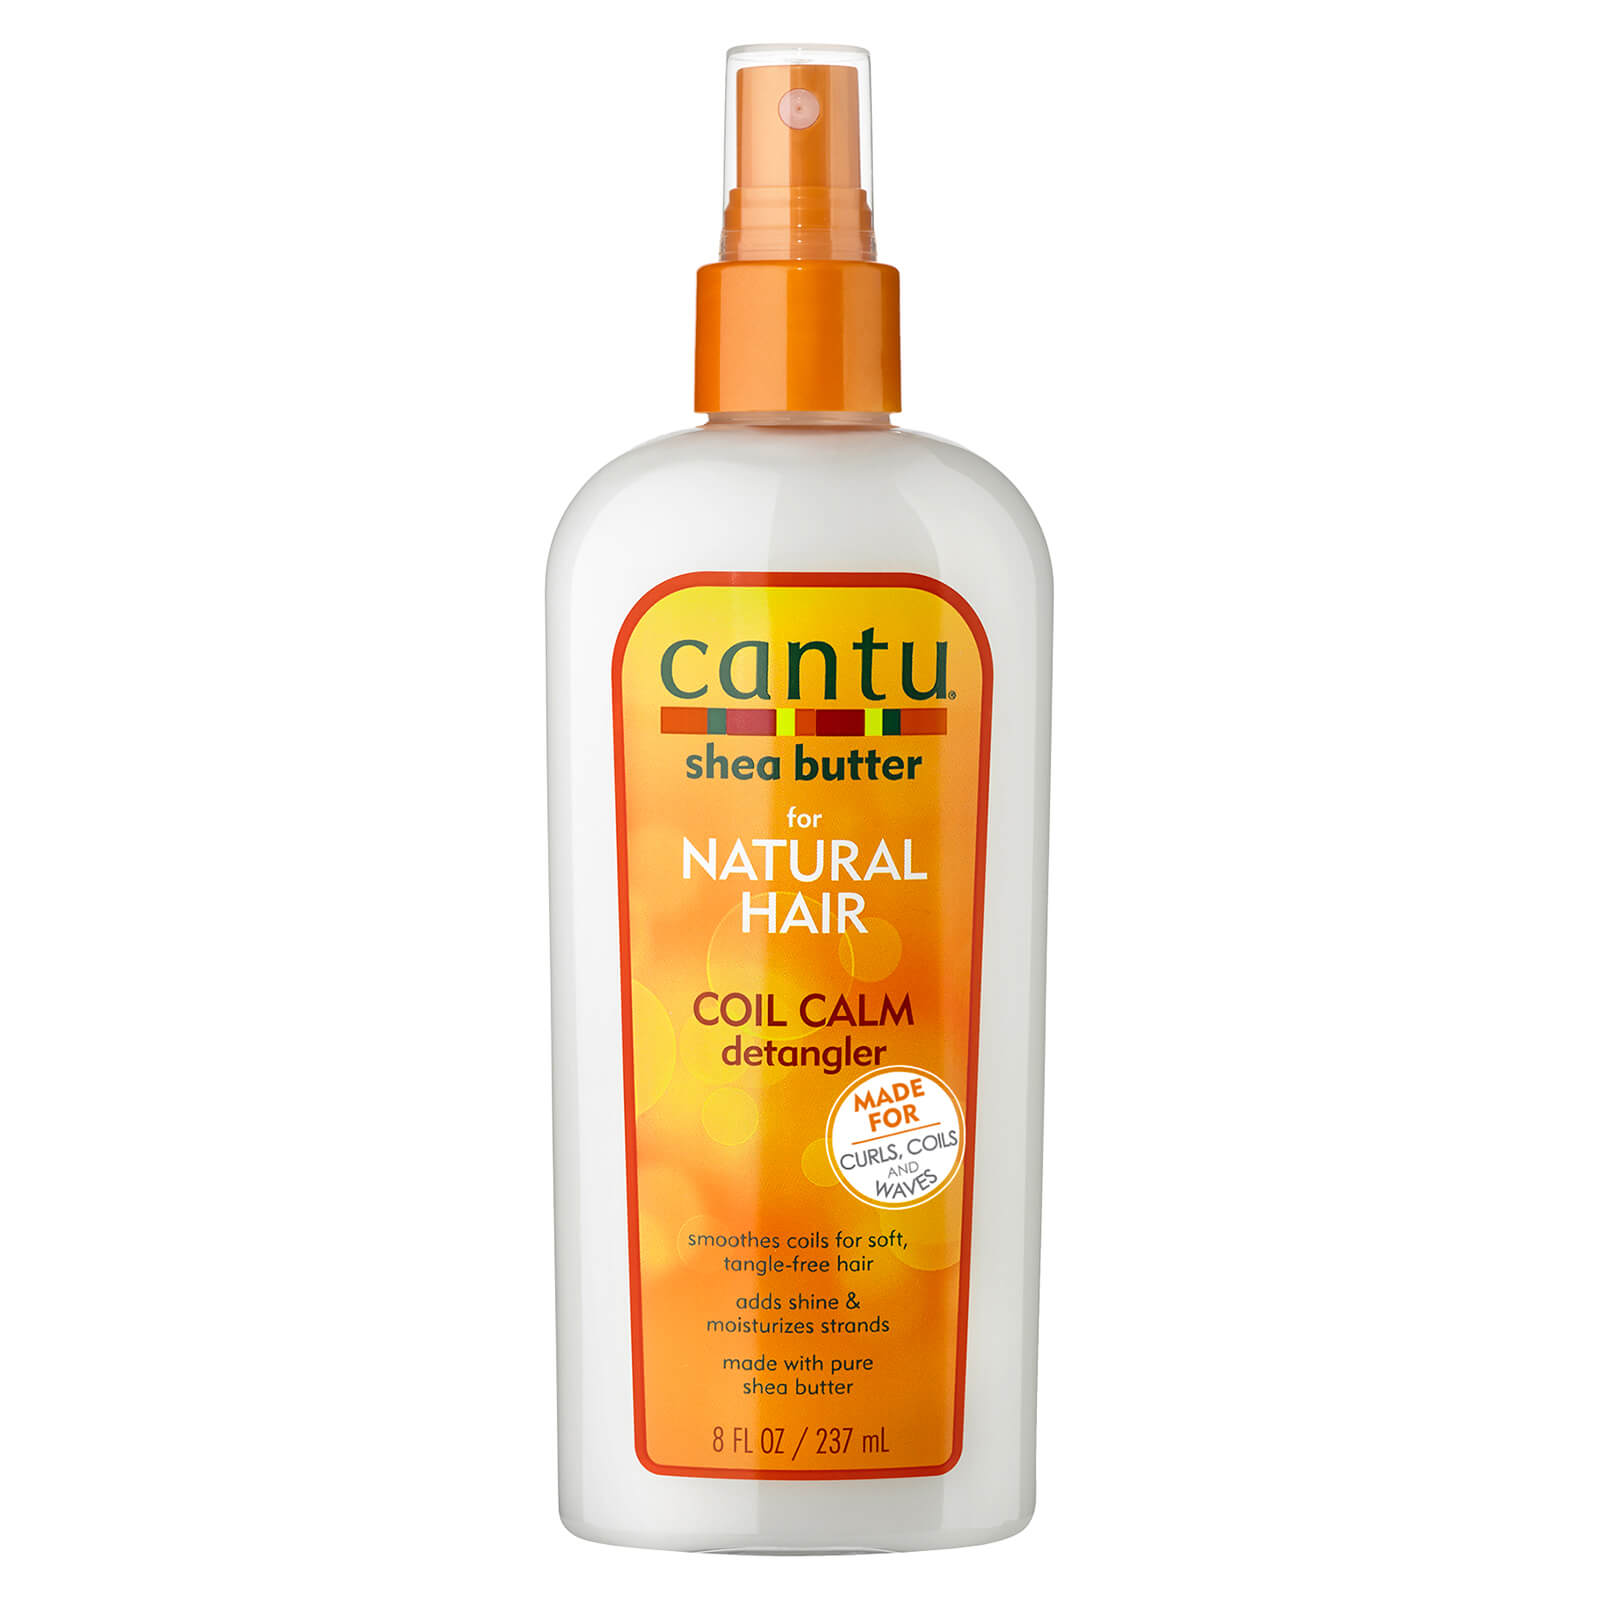 Купить Cantu Shea Butter for Natural Hair Coil Calm Detangler 237ml